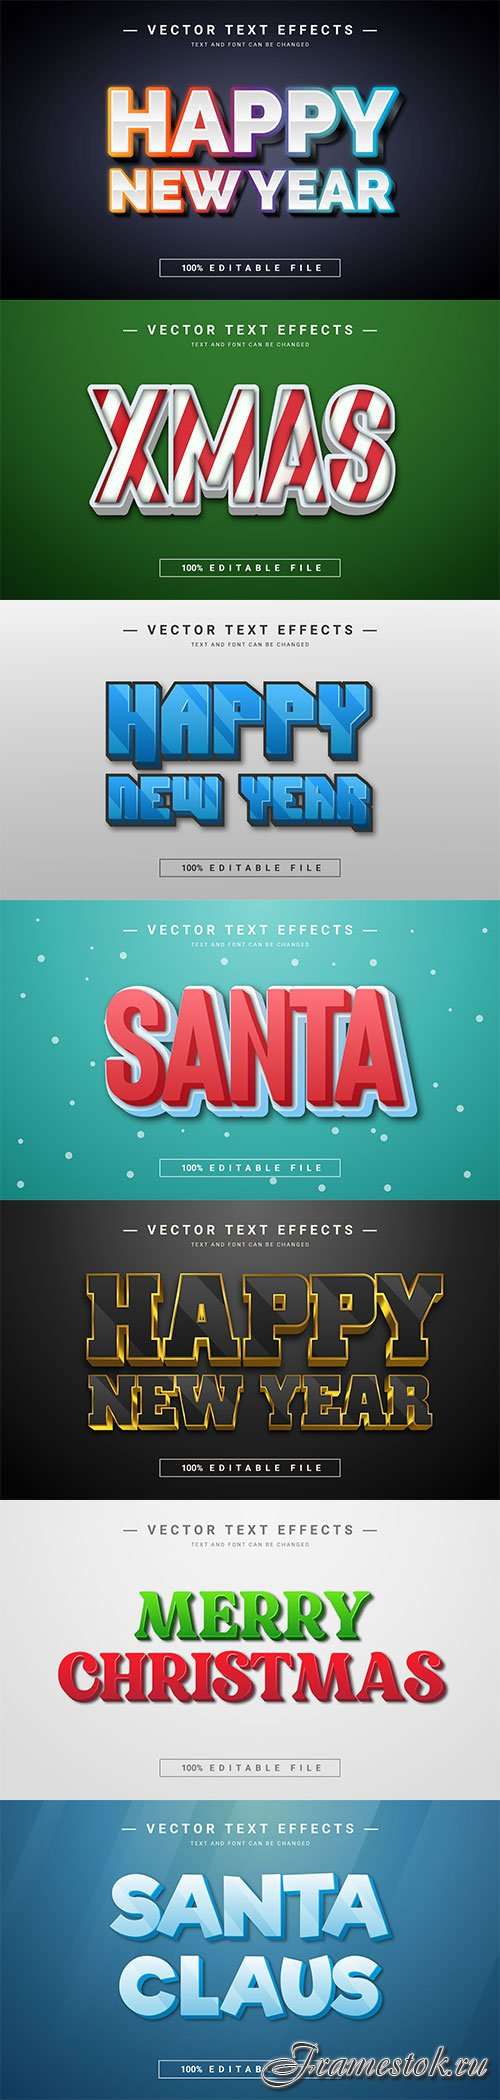 2022 New year, Merry christmas editable text effect premium vector vol 14